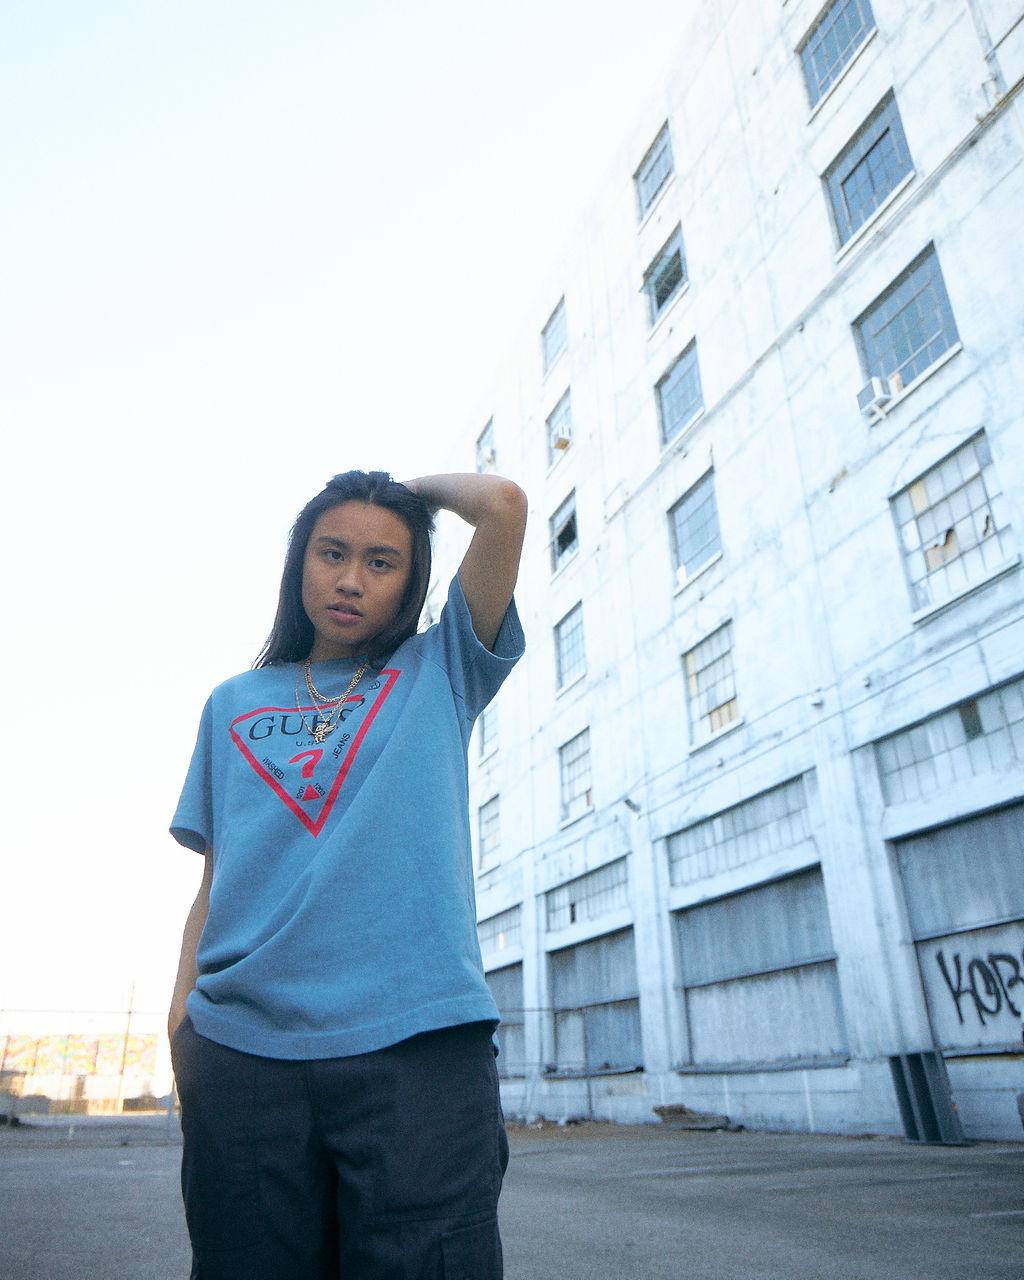 MEAN MUSINGS: An interview with Emily Vu